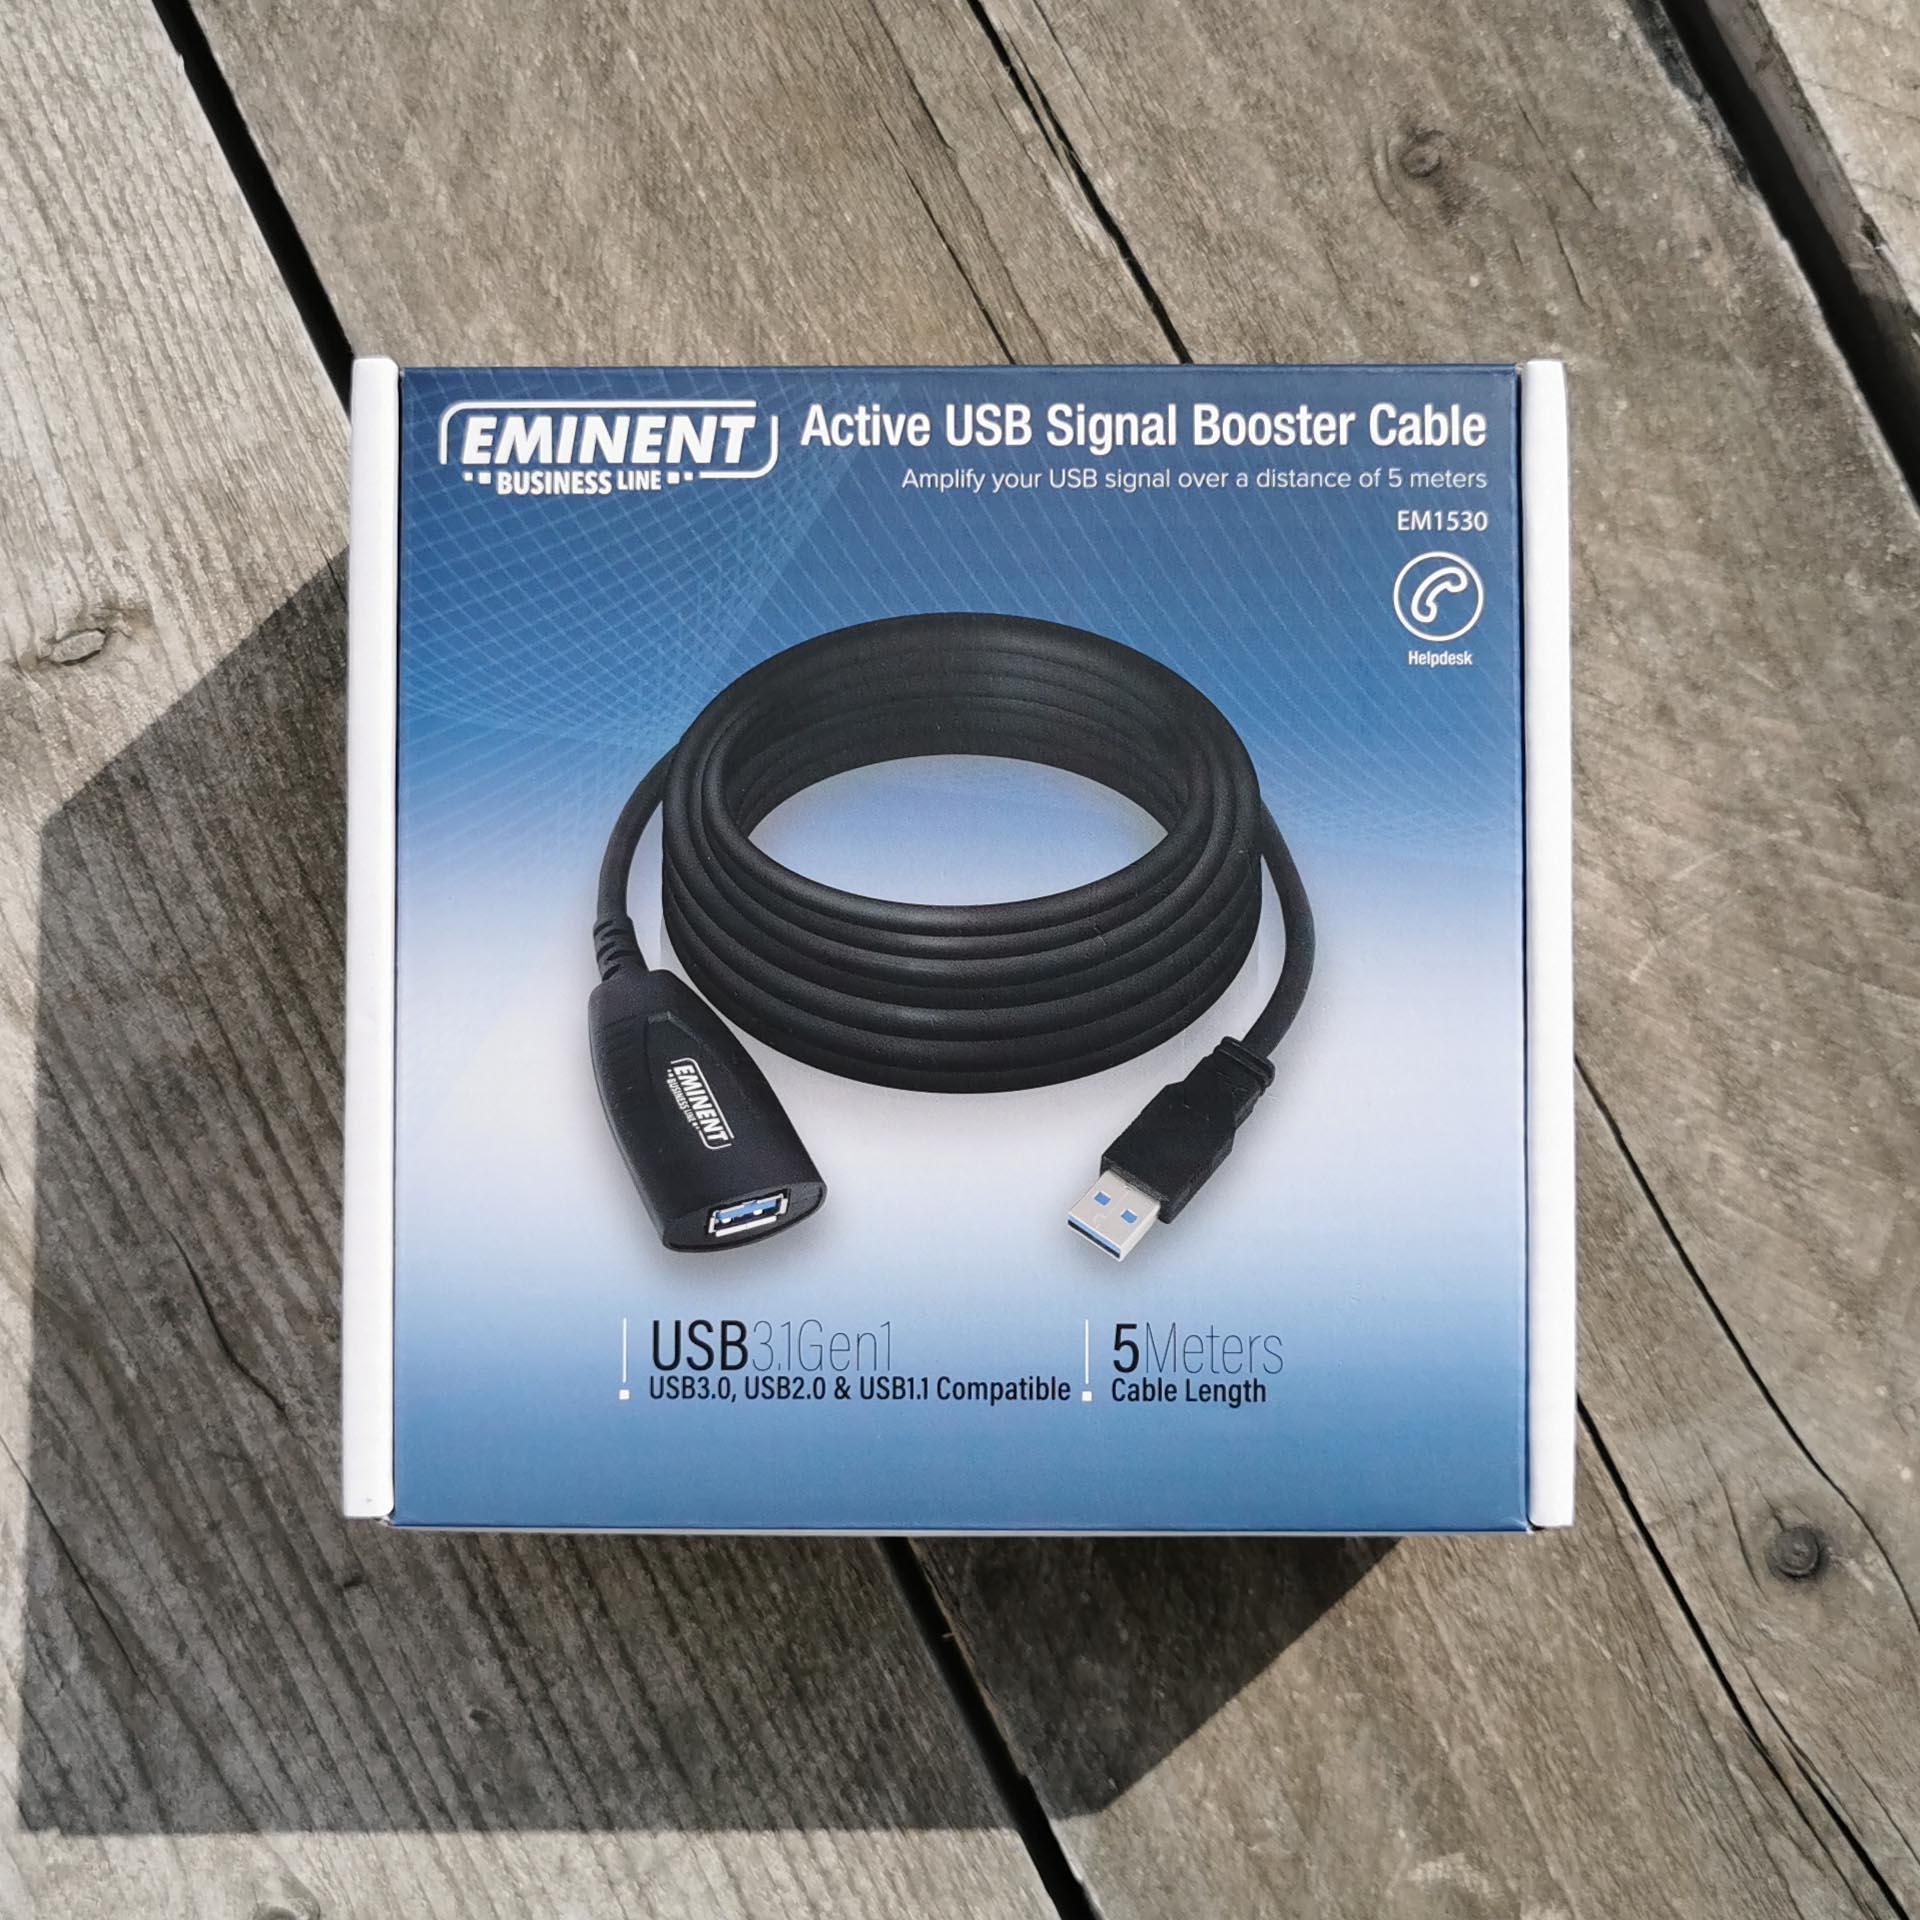 Eminent Business Line Active USB Signal Booster Cable EM1530 Doosje